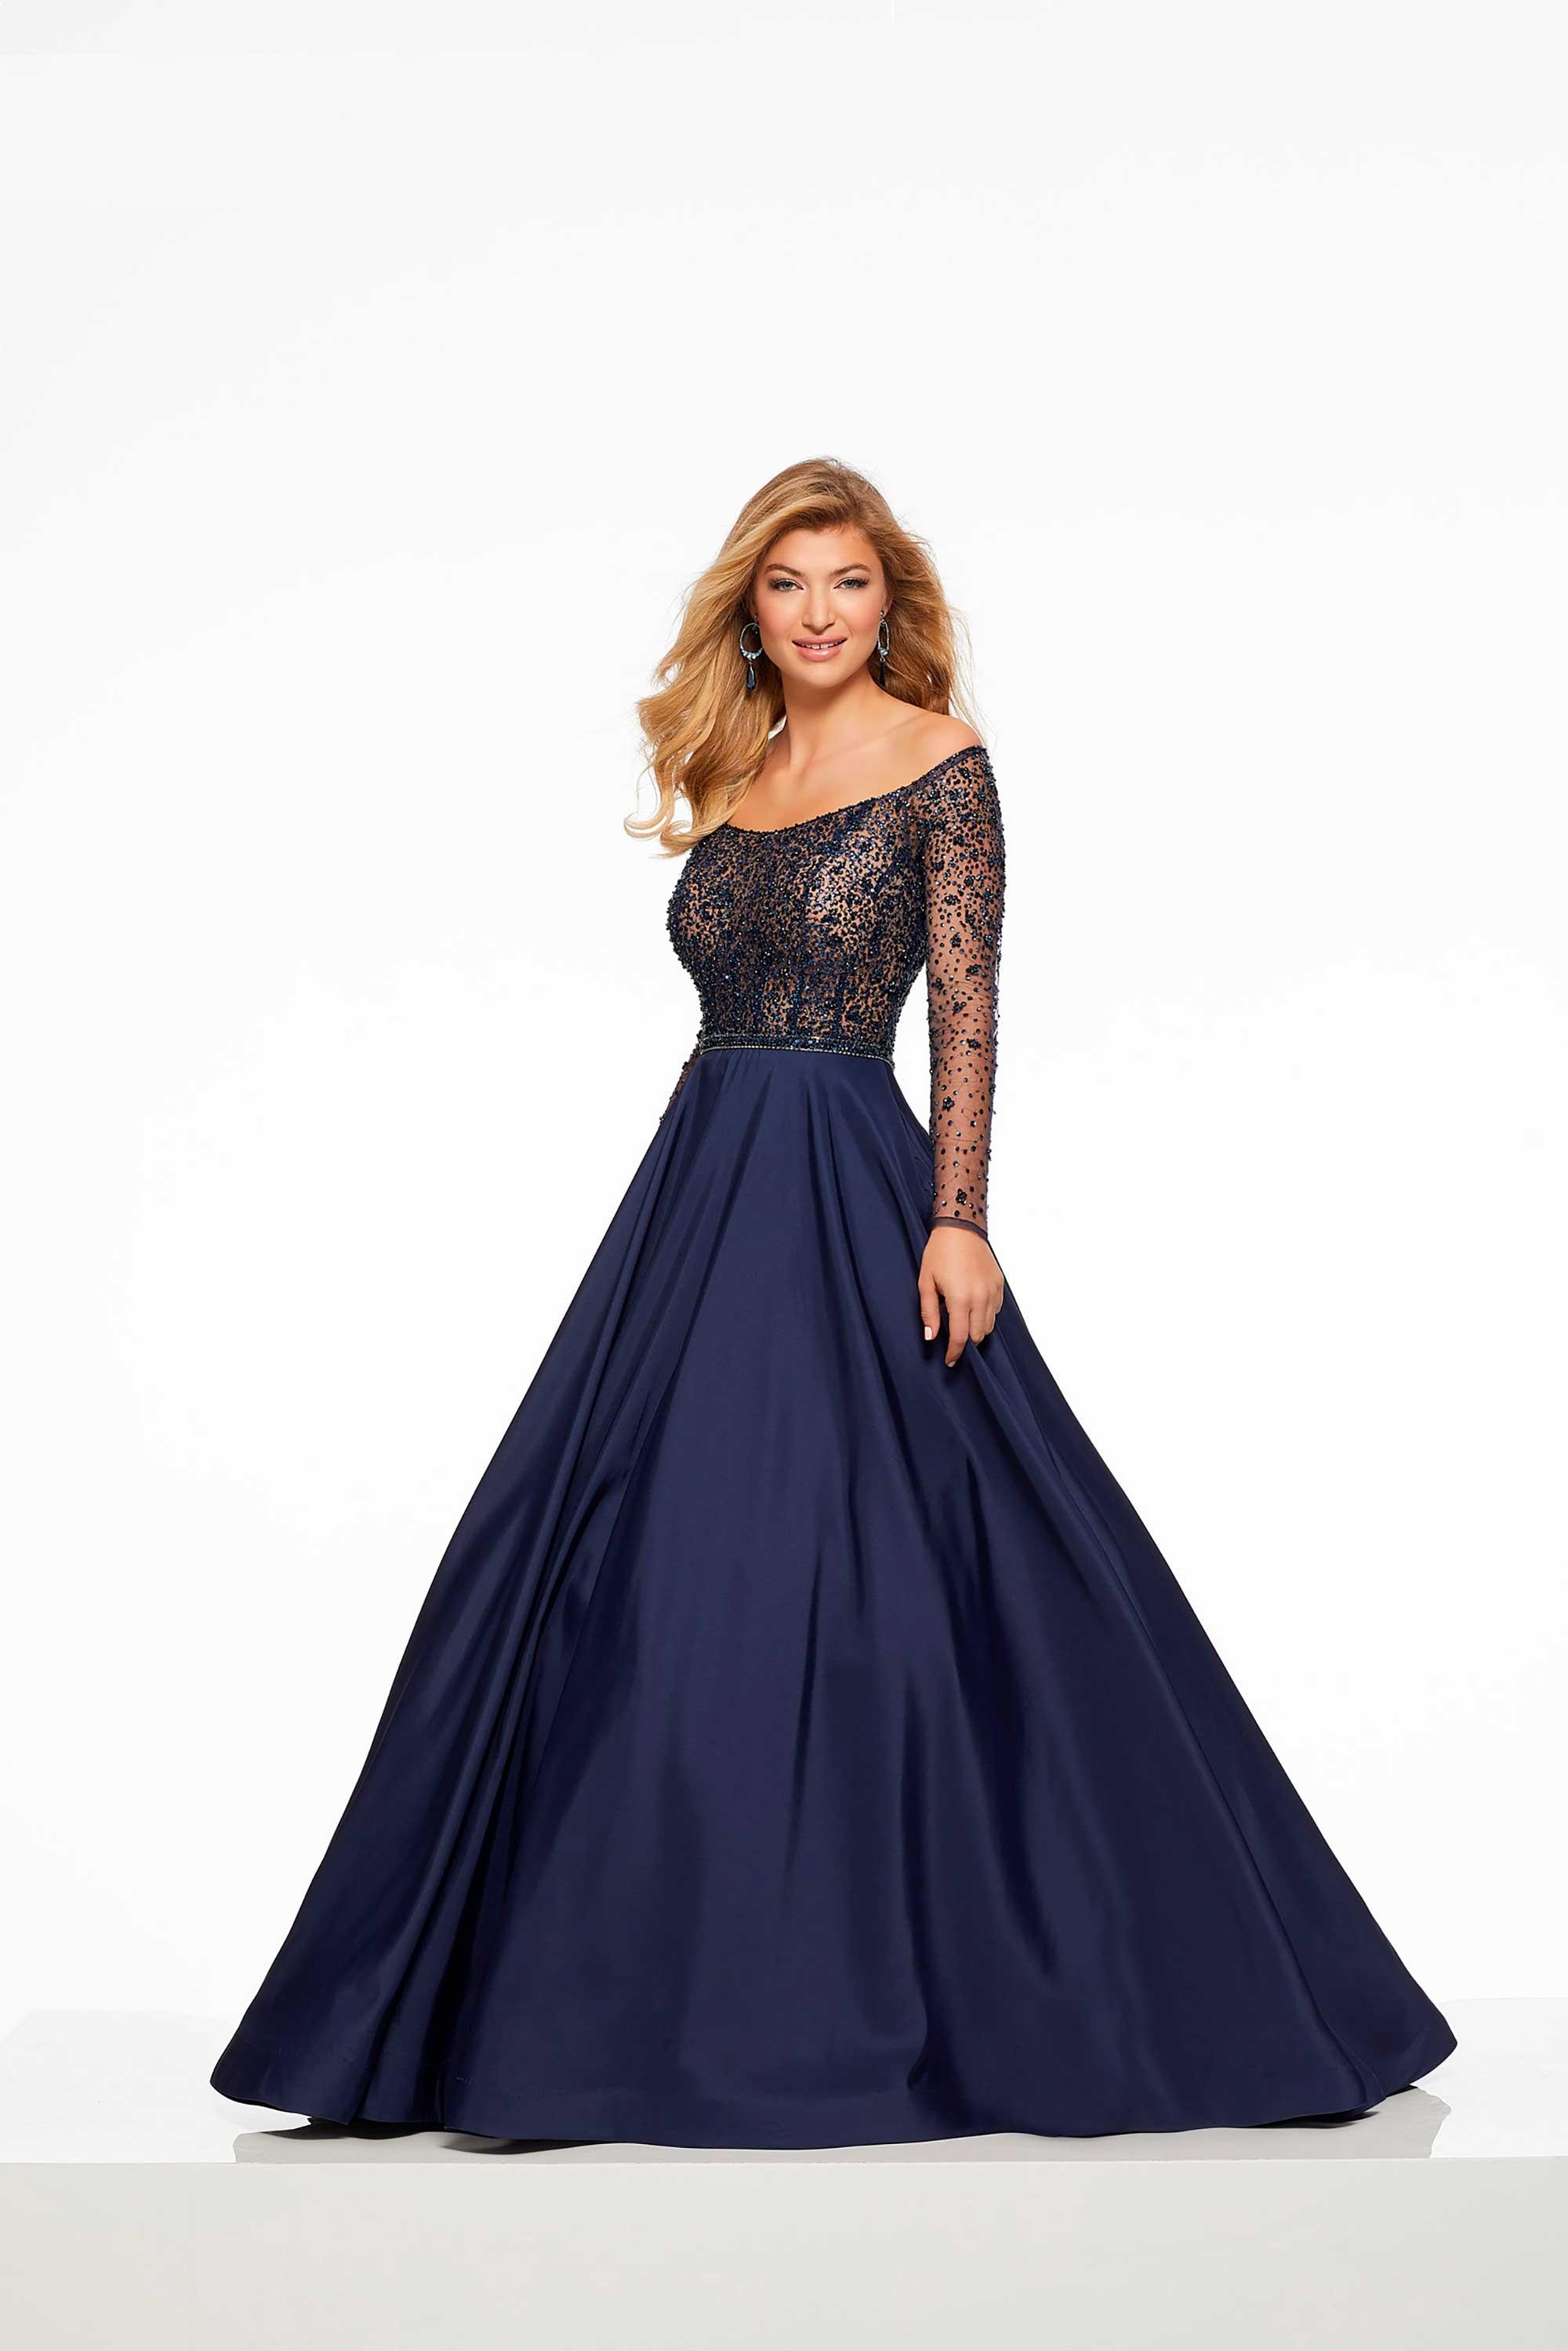 Vestido Lucía Fiesta 2019 mod. 43031 - 4